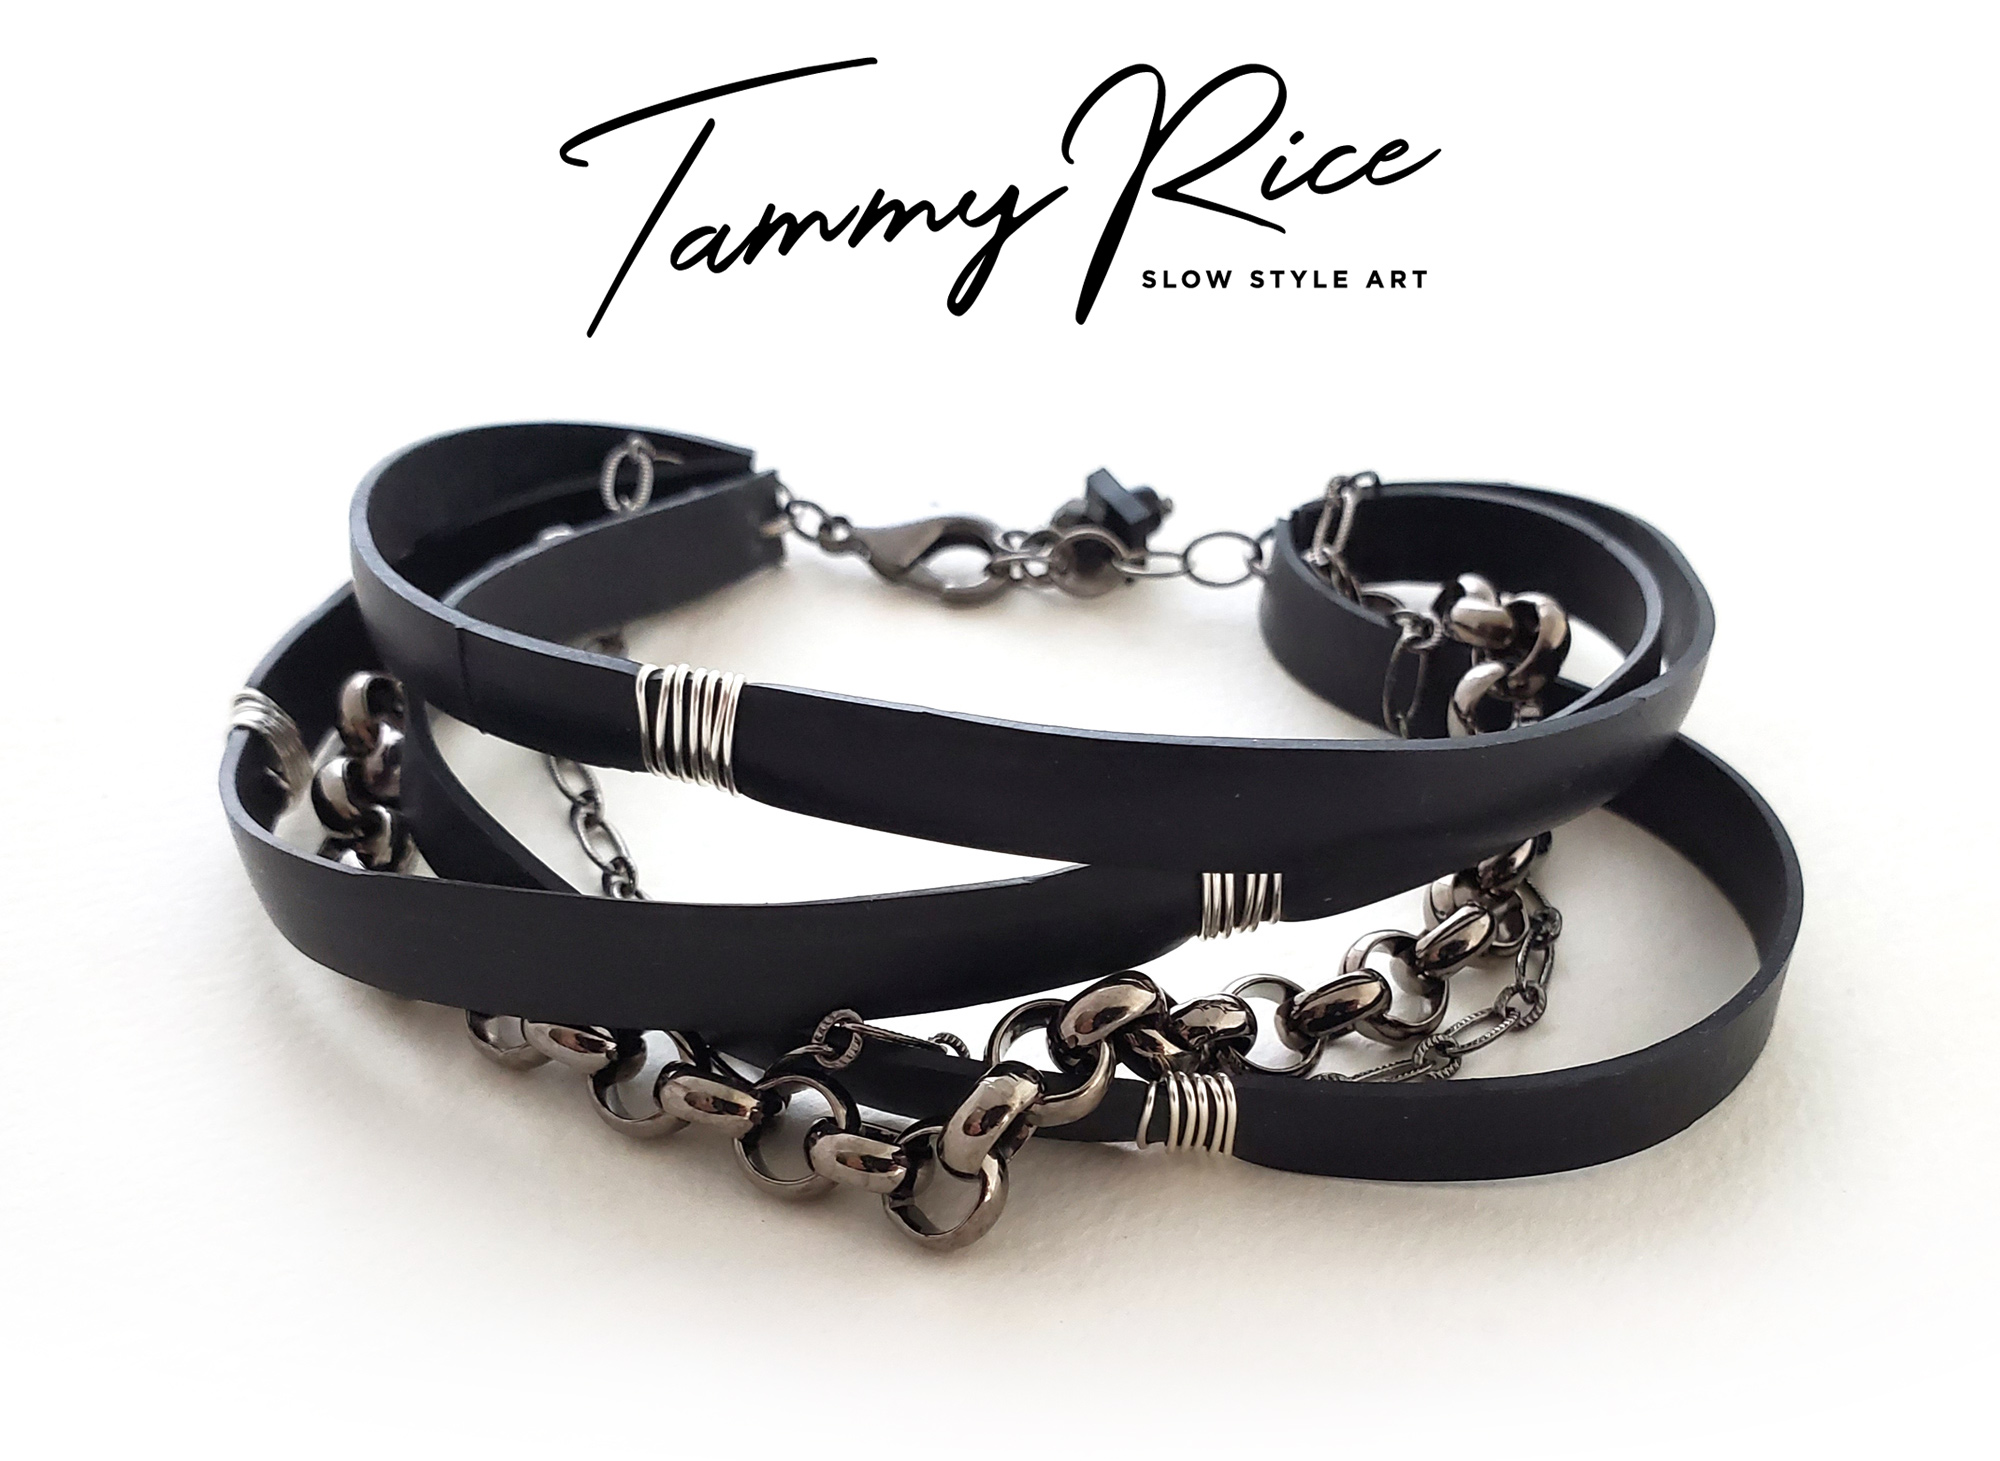 Tammy Rice Brand Design